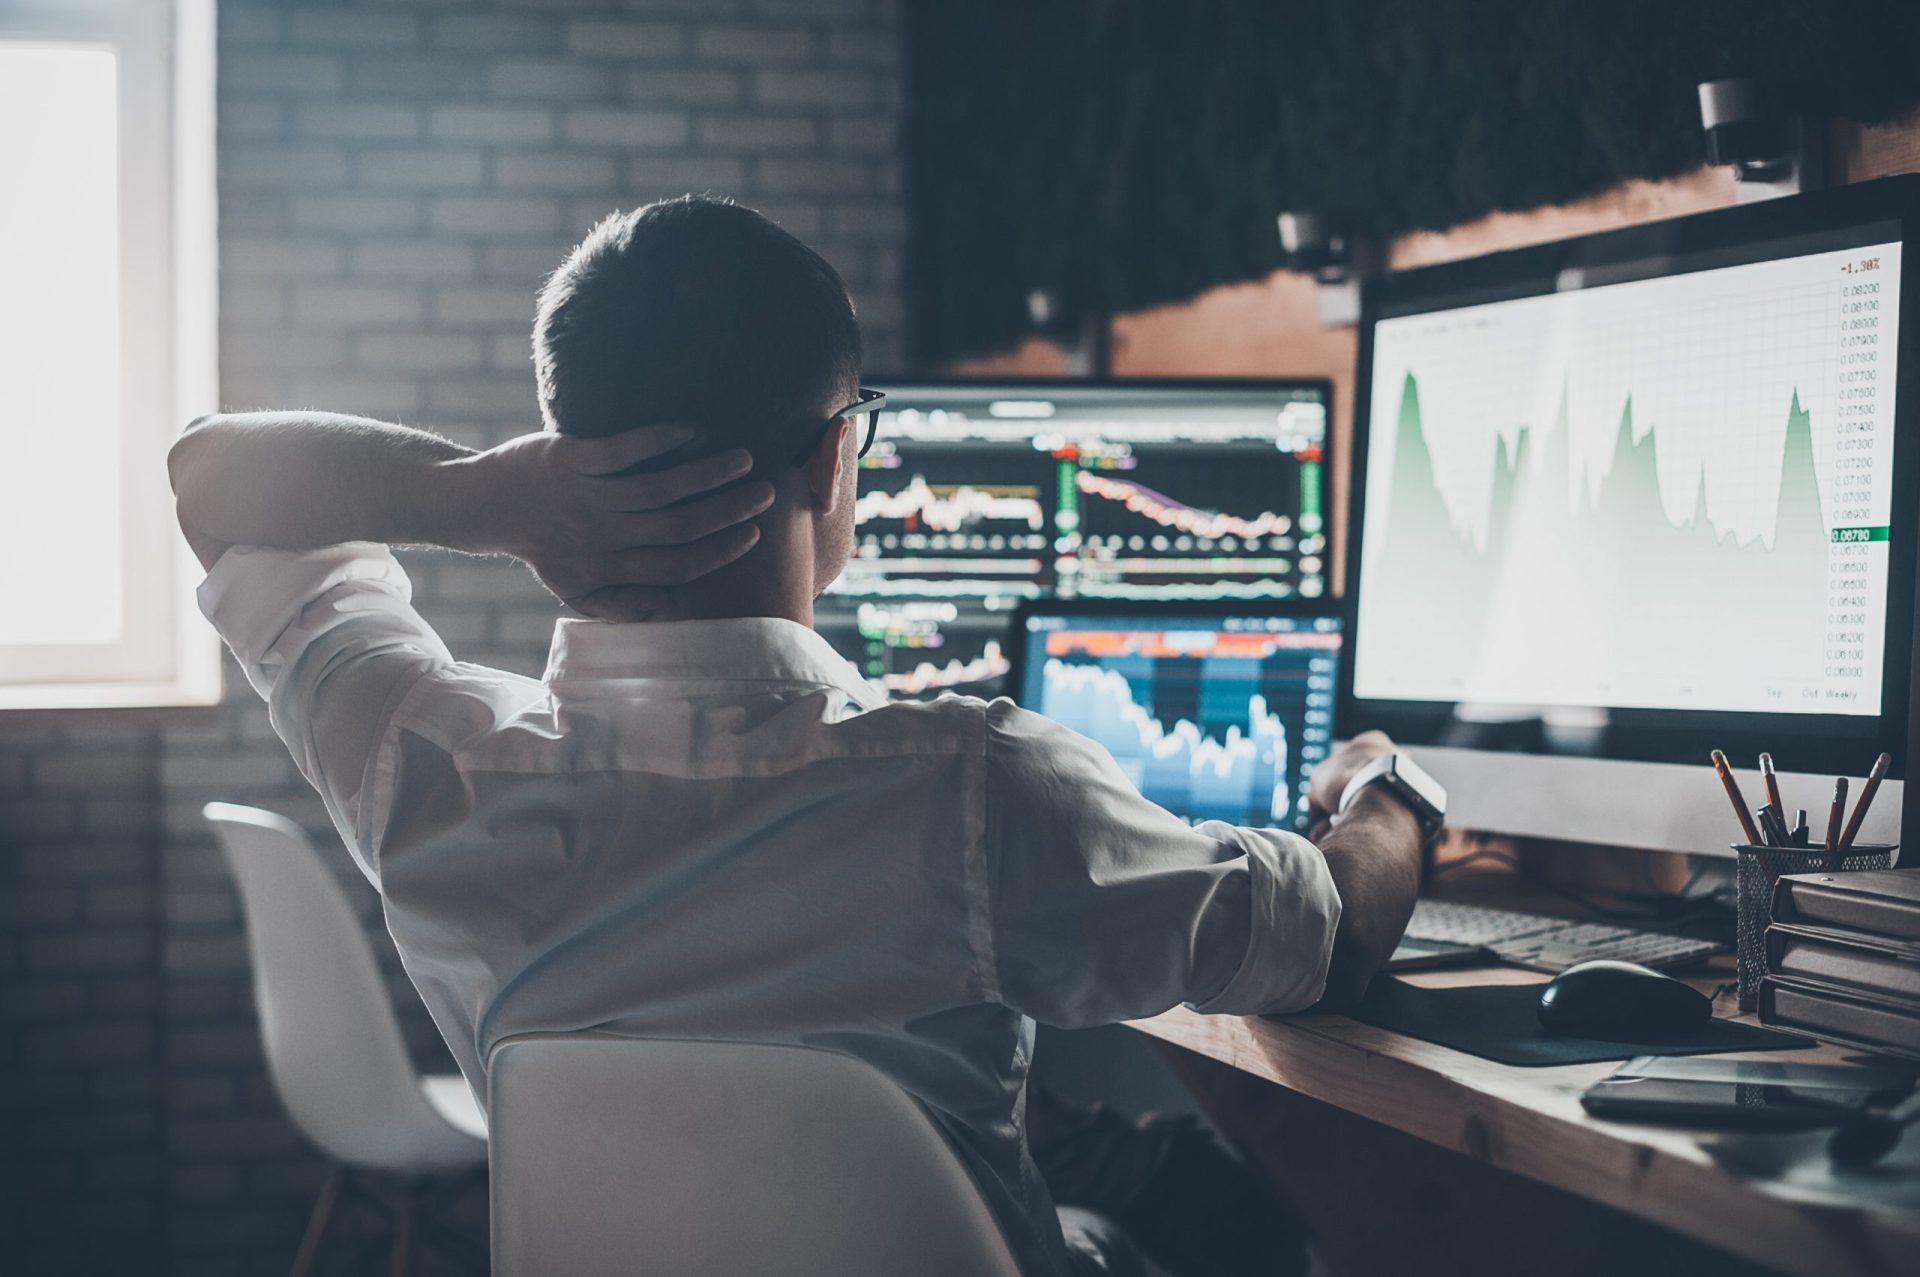 beleggersfouten